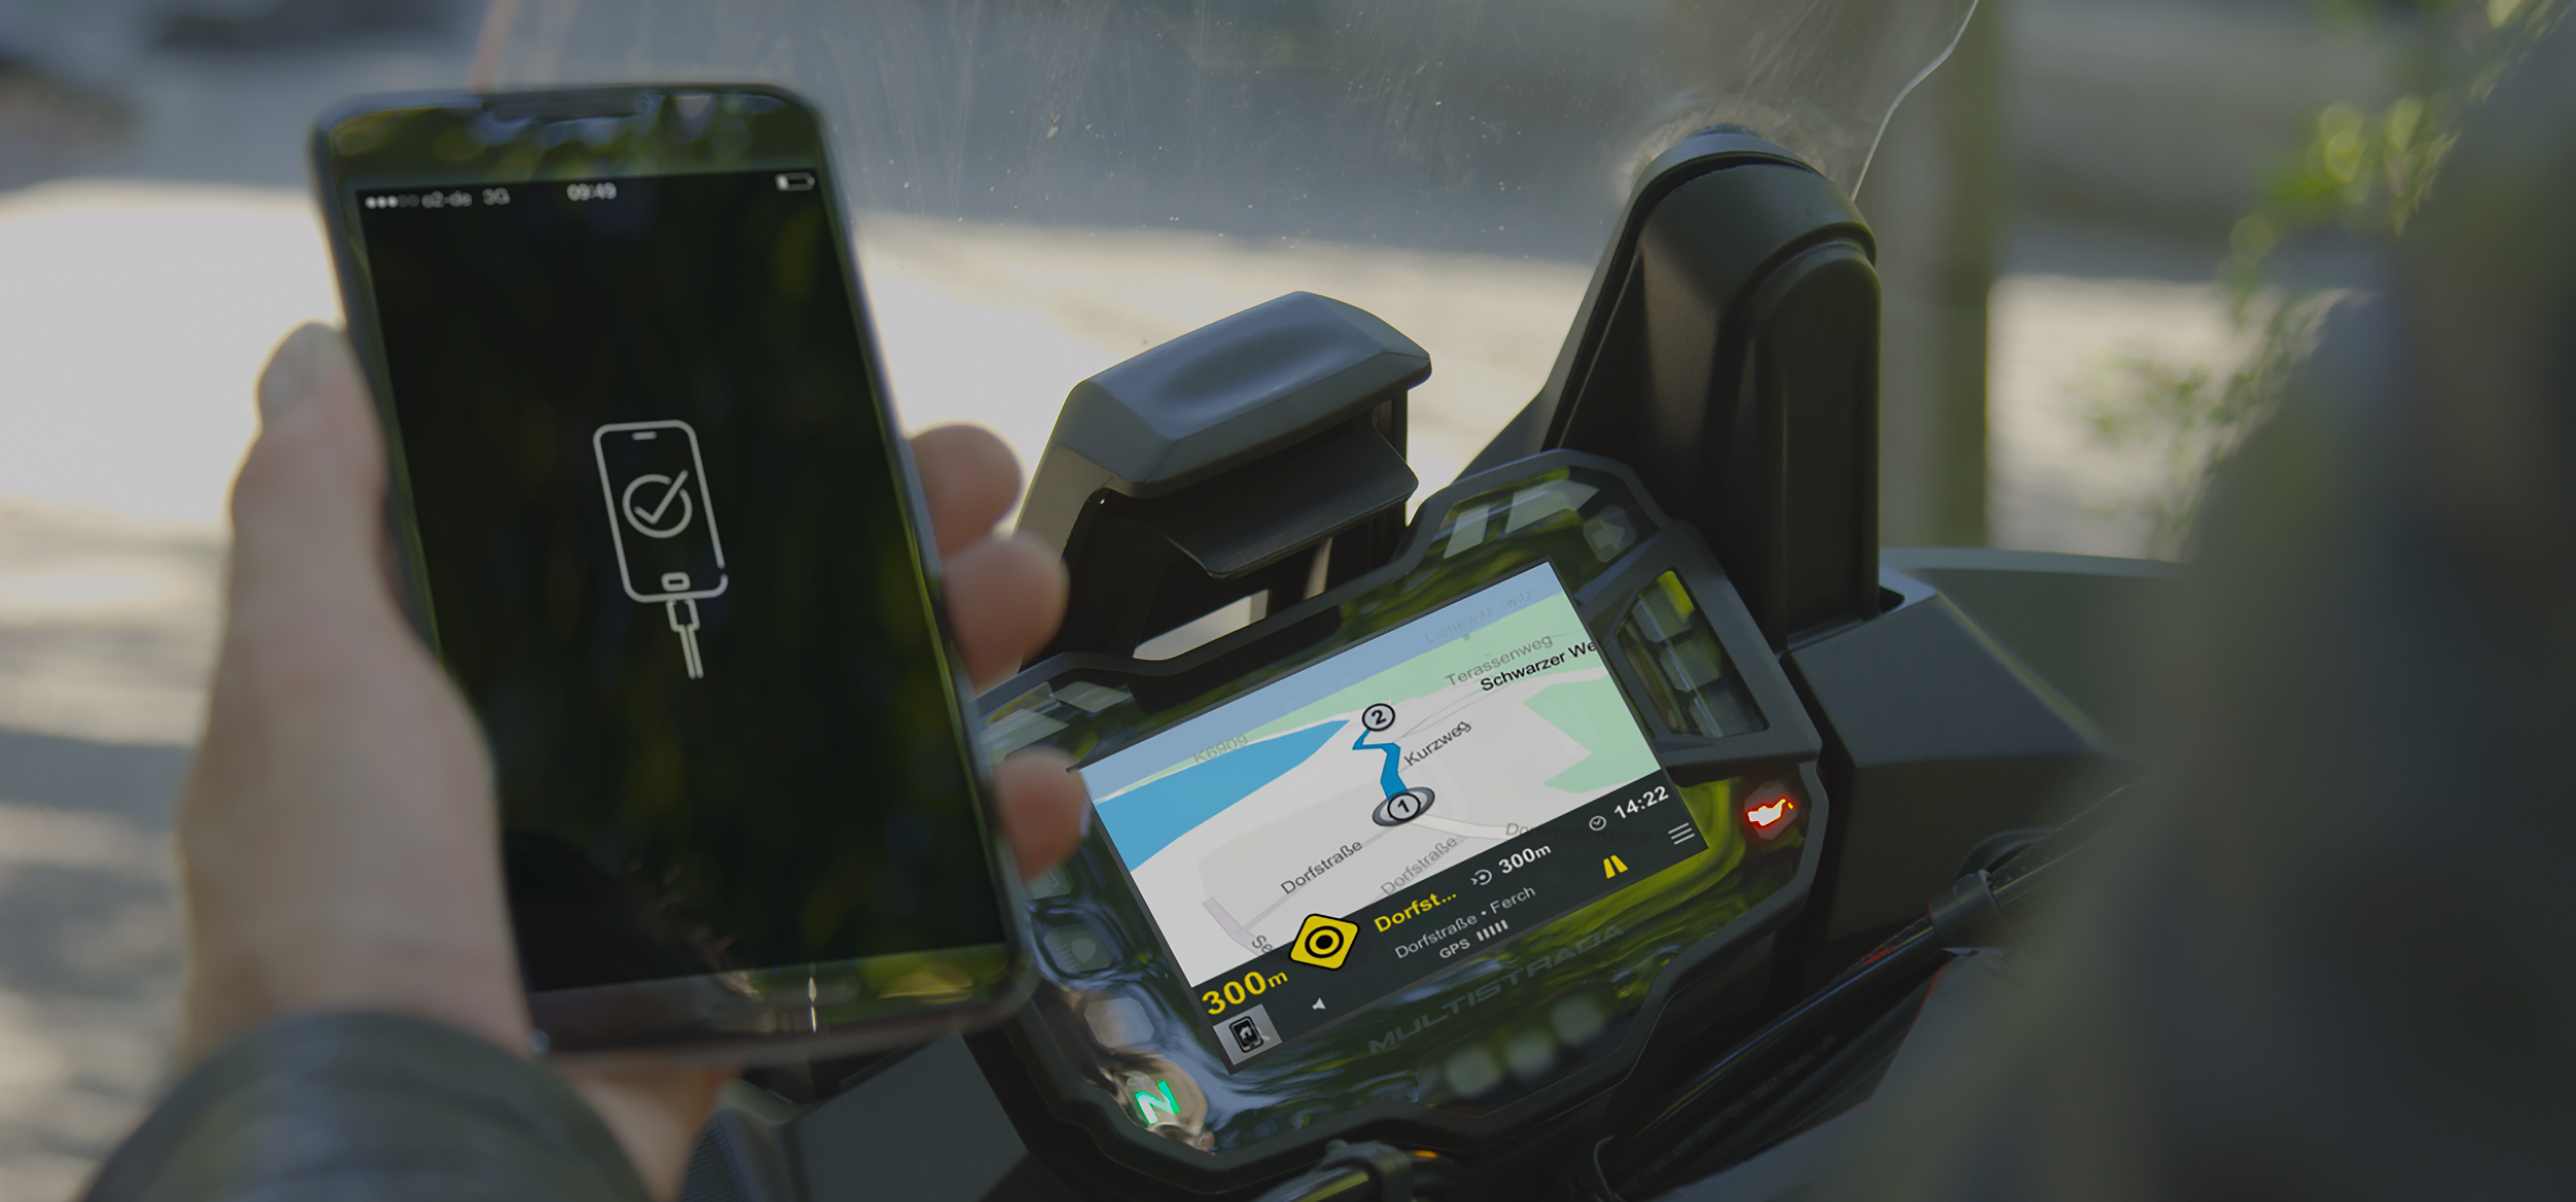 Smartphone integration mySPIN